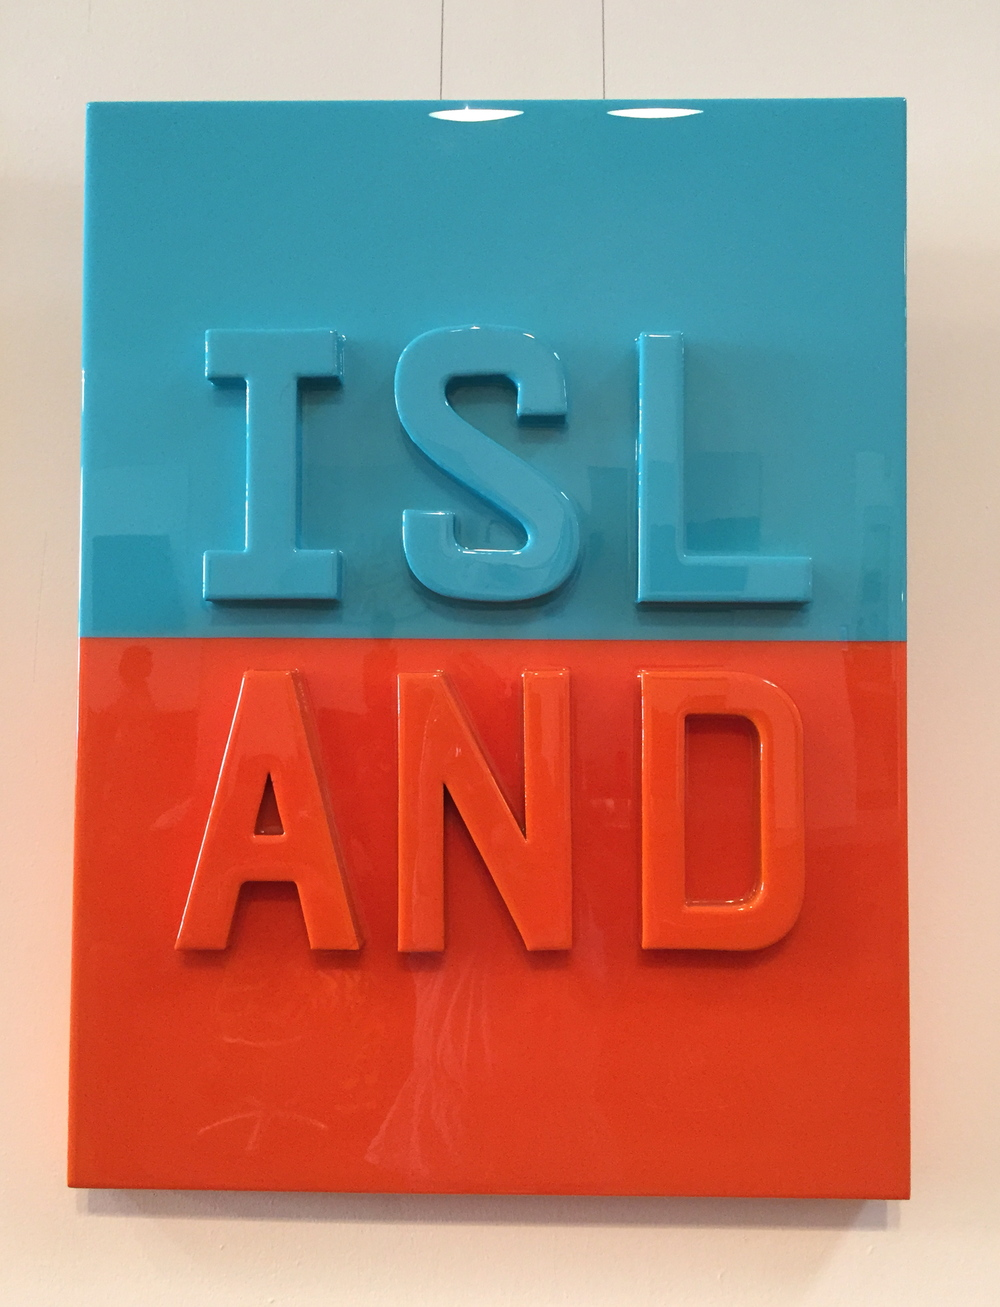 "ISLAND, 2016   Cardboard, acrylic and resin on wood panel.  36"" x 24""  $3300"